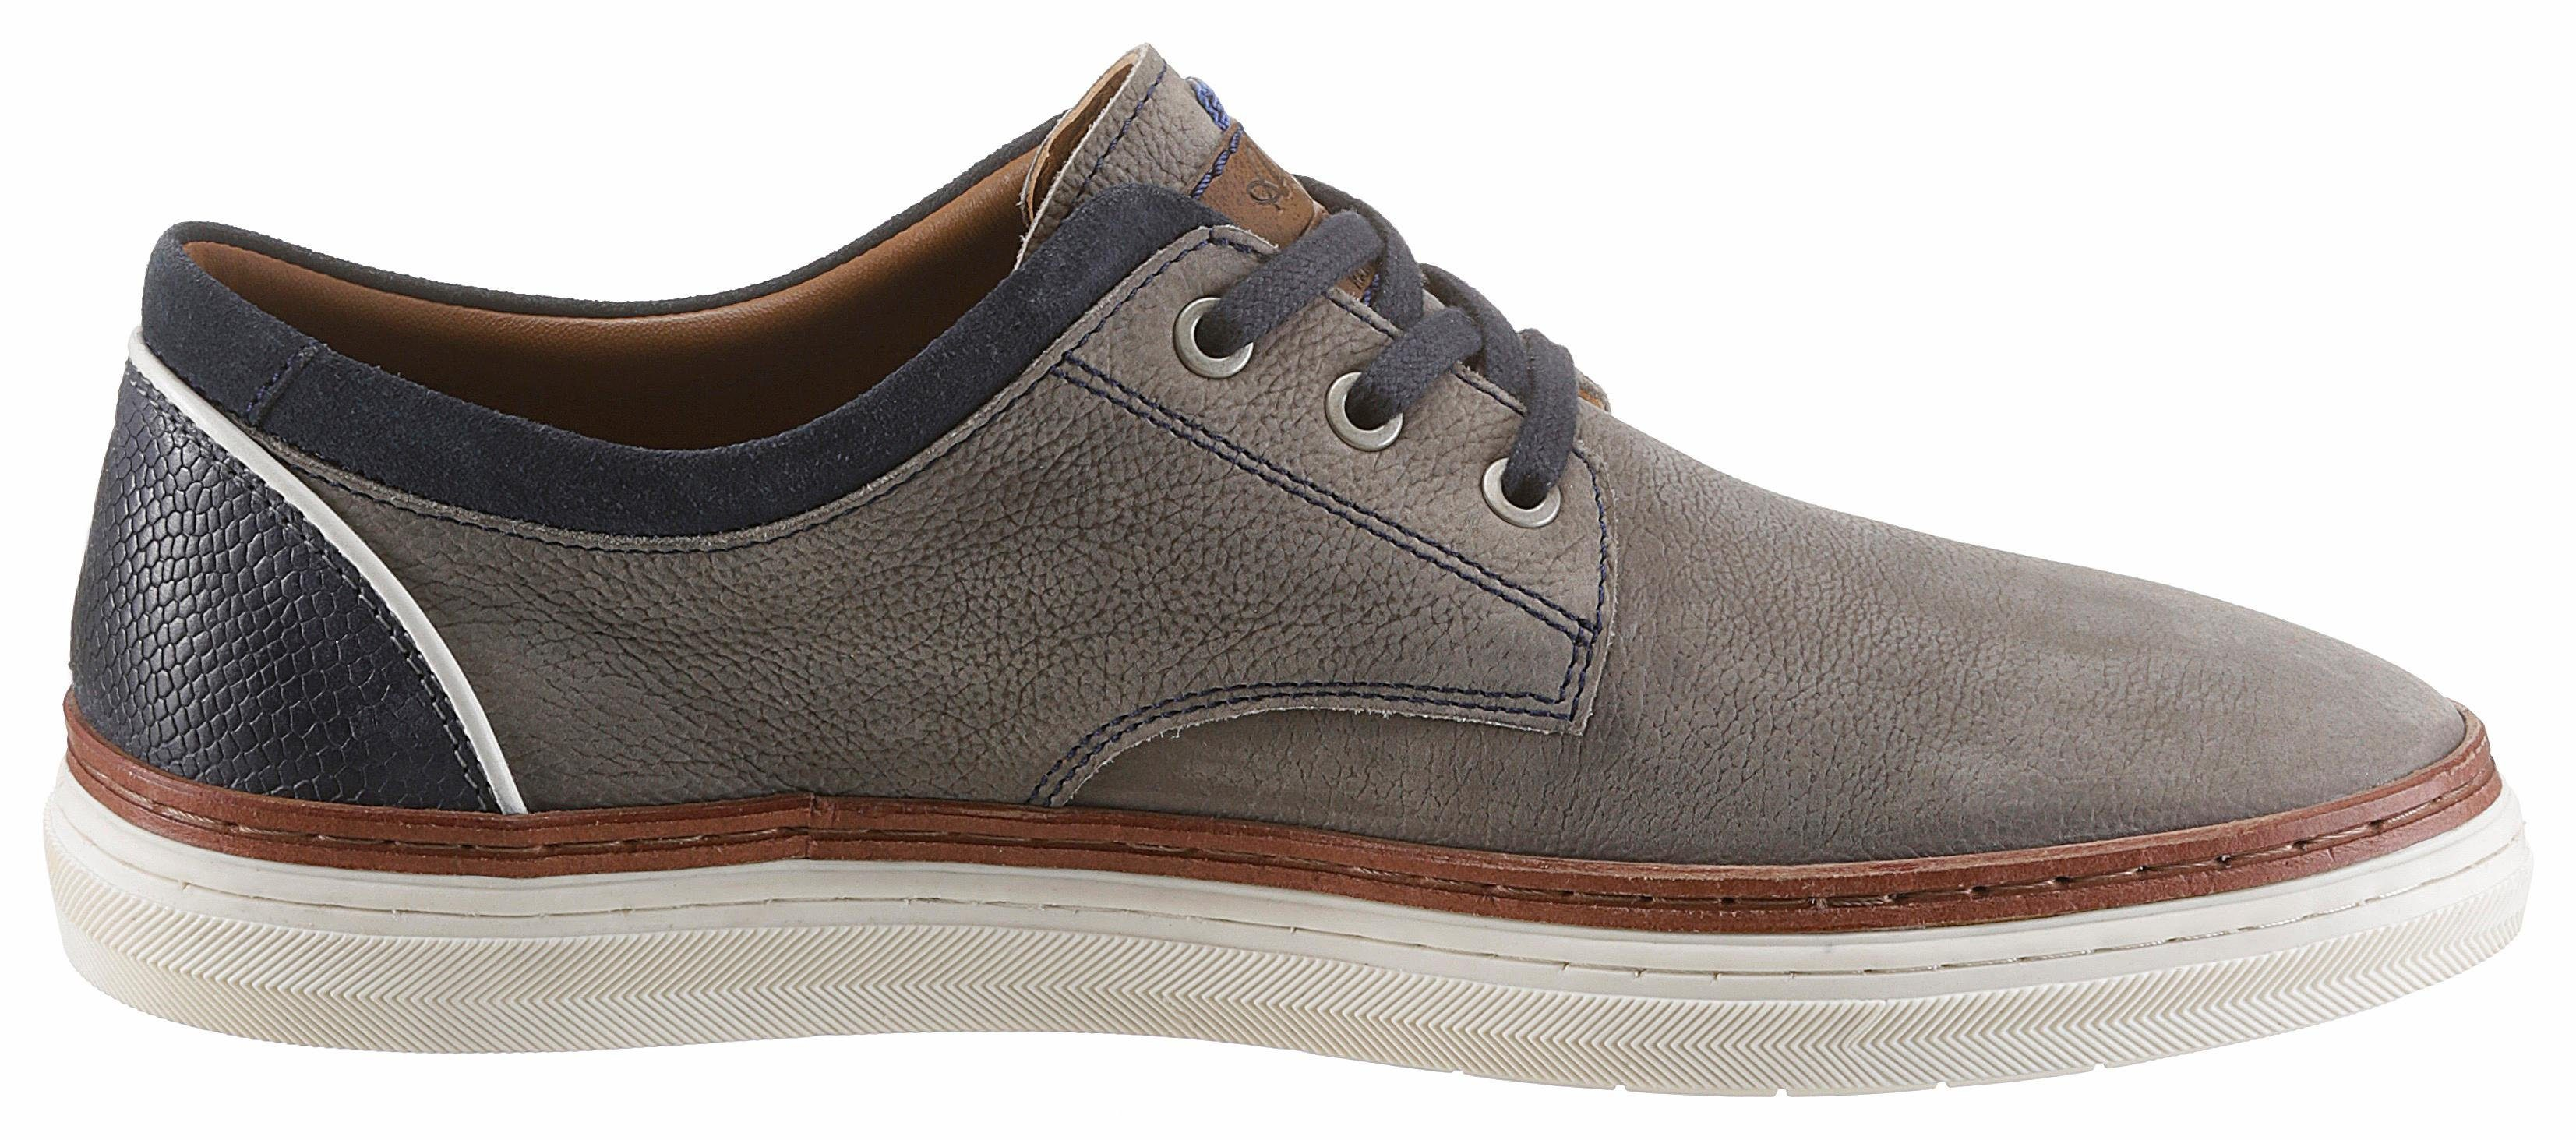 Australian Tigana Sneaker, mit gepolstertem Schaftrand online kaufen  grau-navy